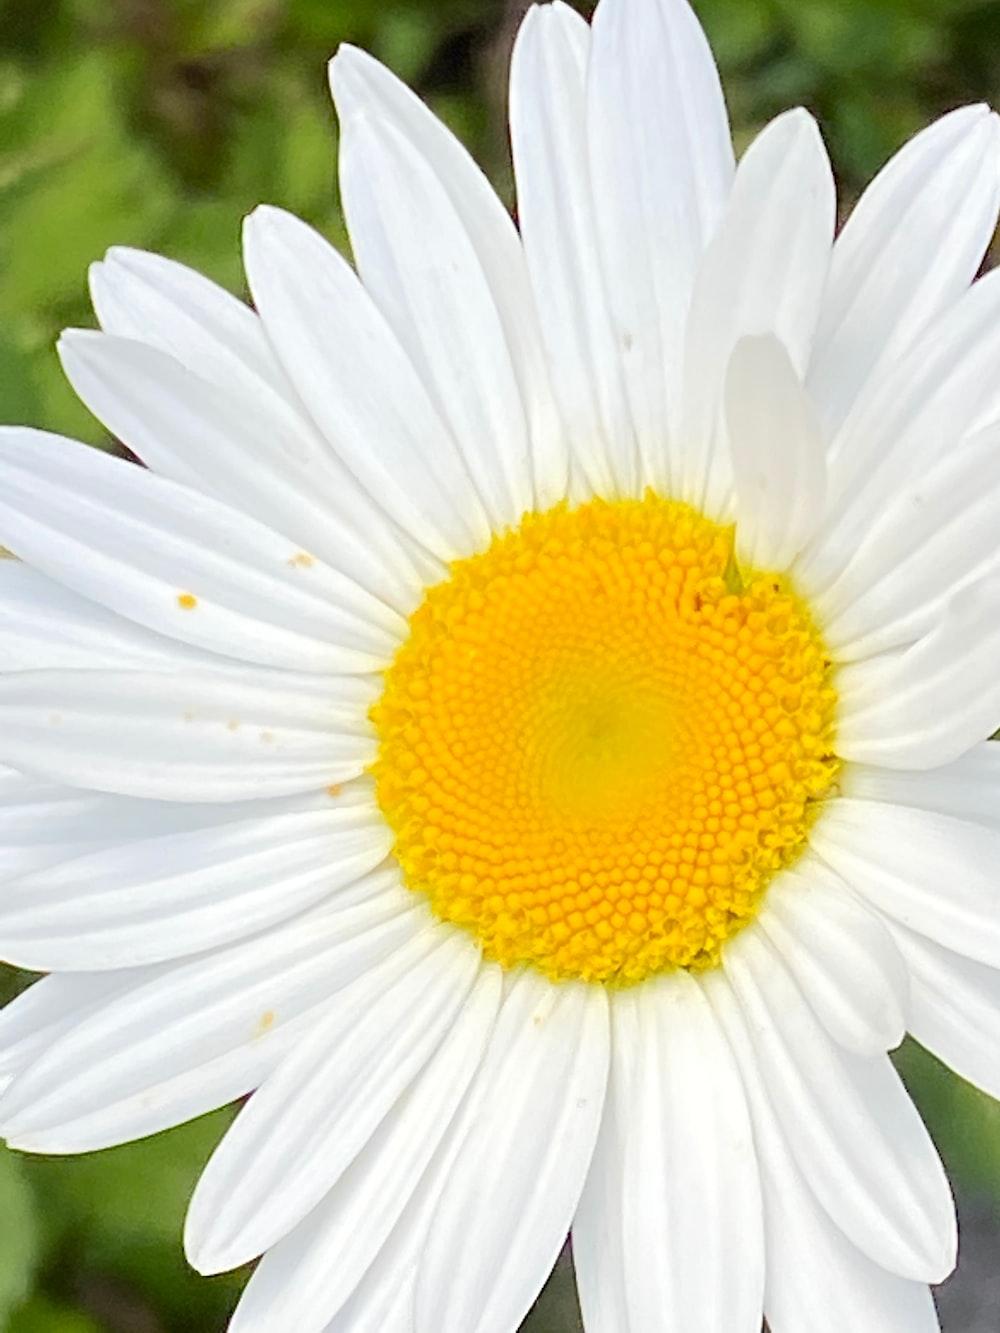 white and yellow daisy flower